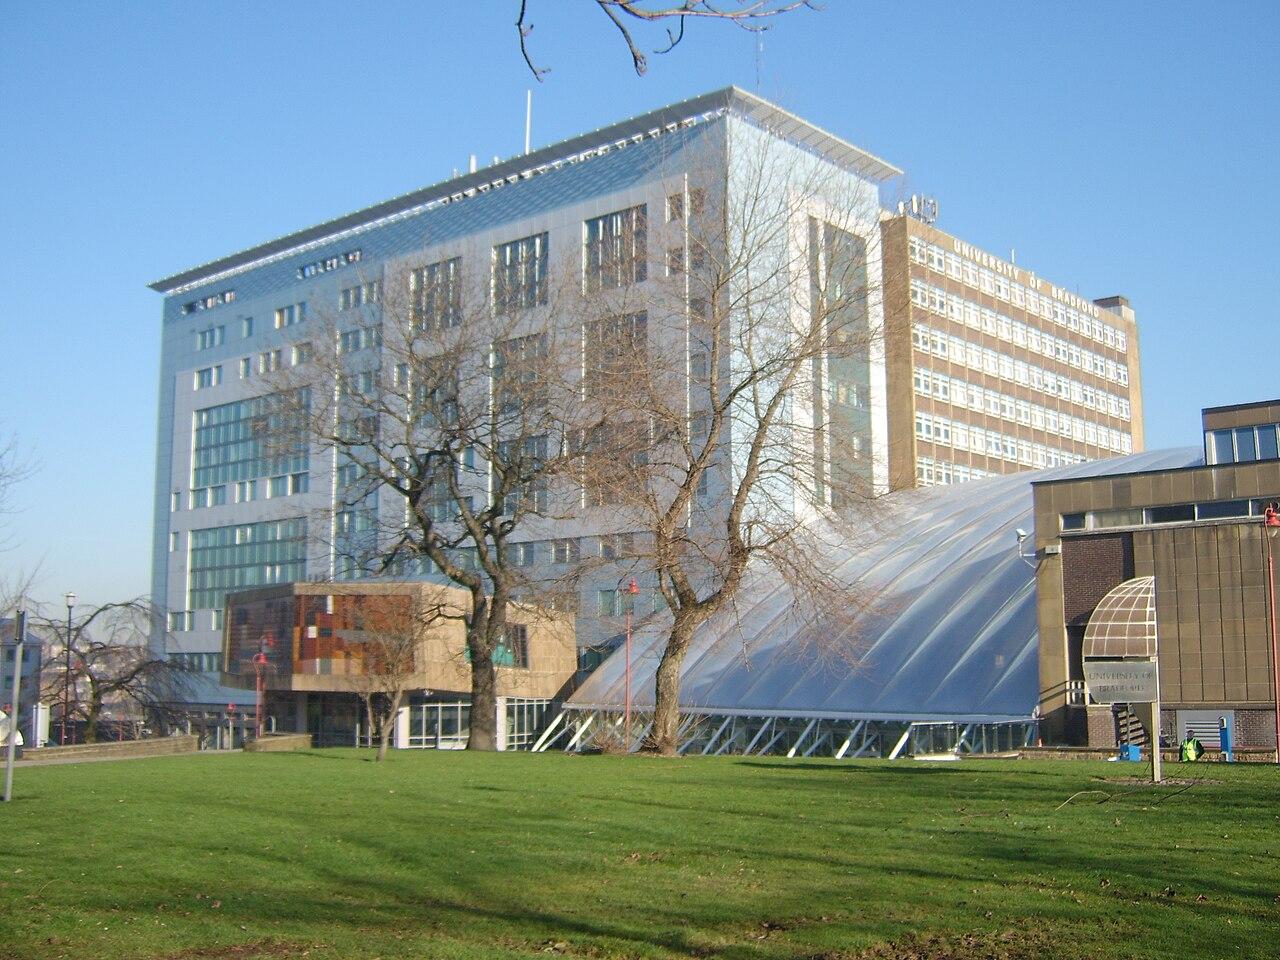 university of richmond dating Posts about university of richmond written by gayrva.